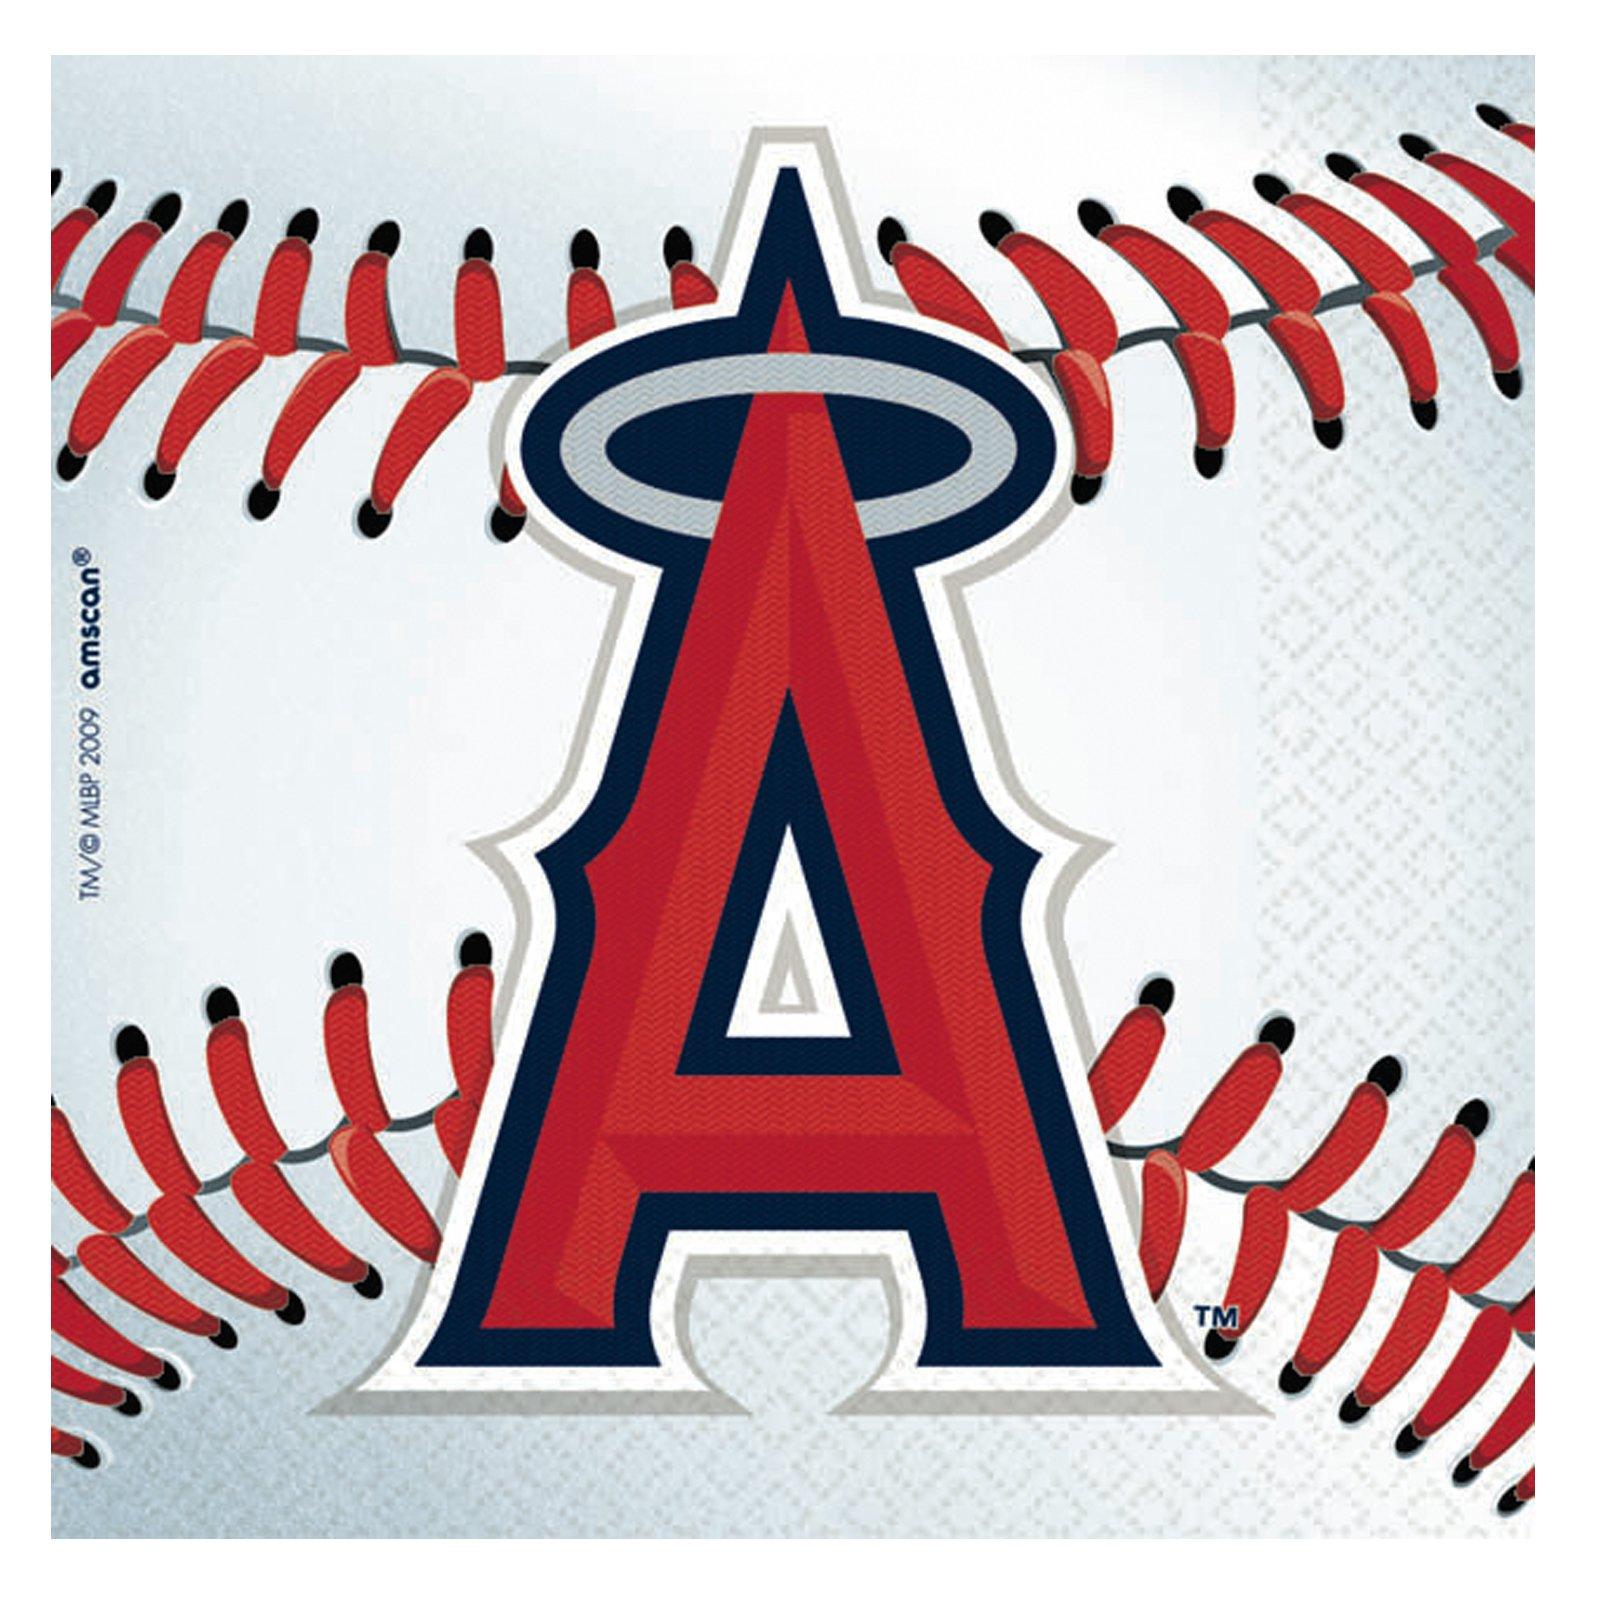 Angels Baseball Logo Los angeles angels baseball 1600x1600